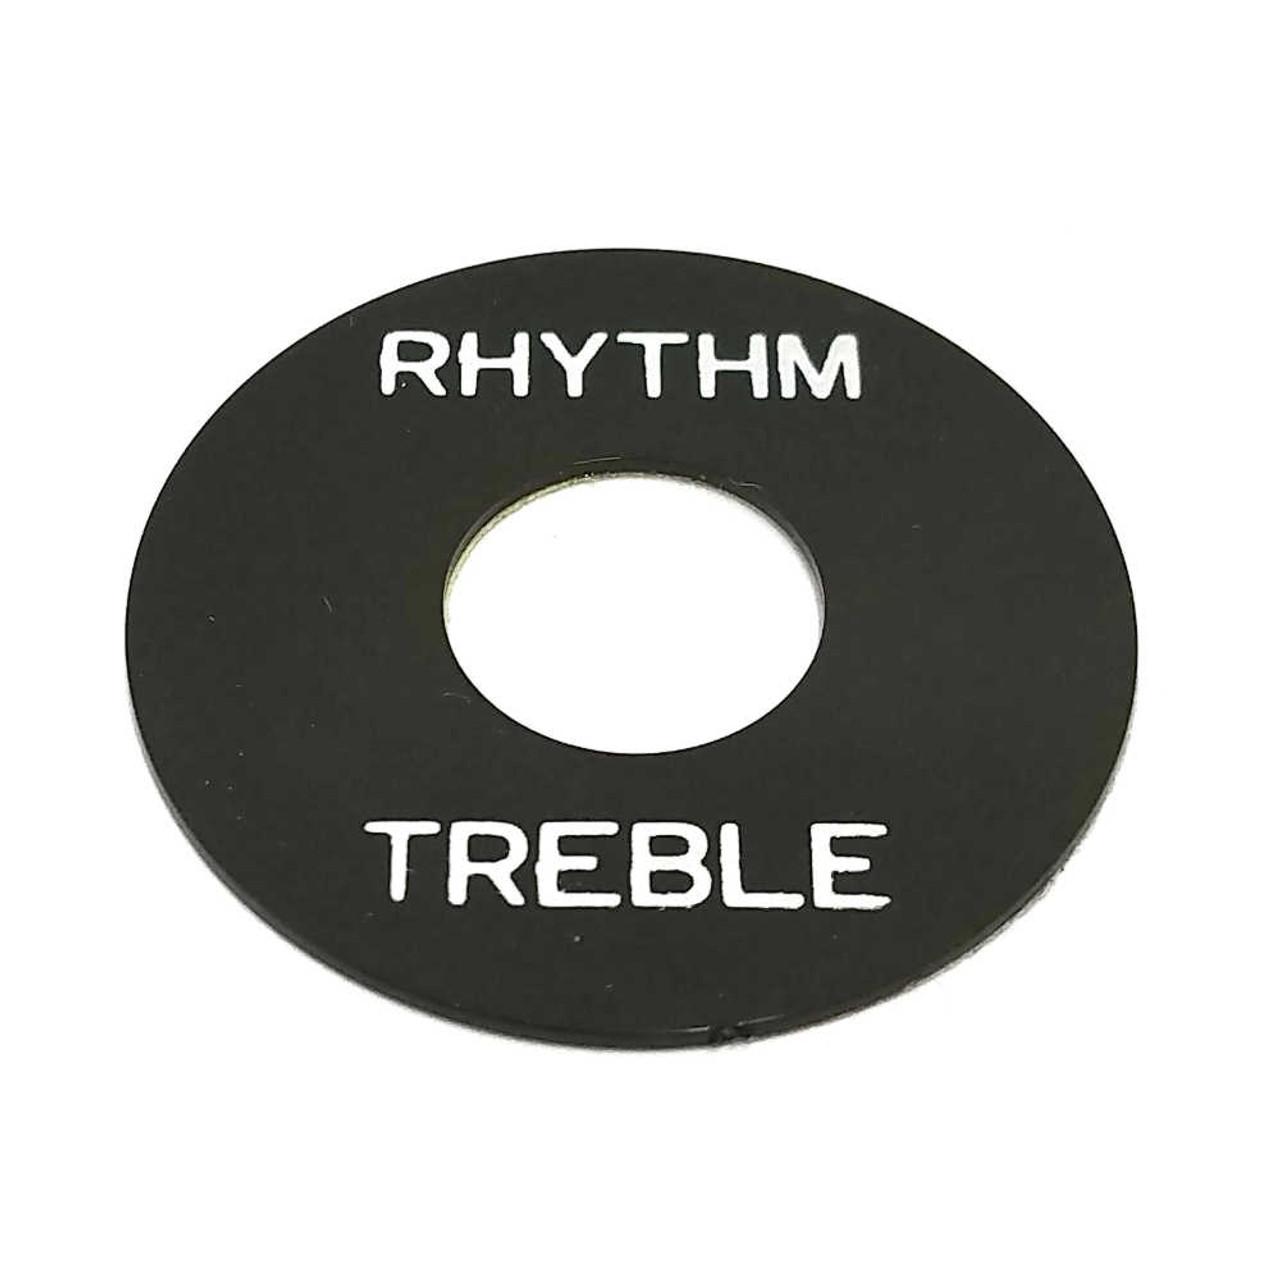 Rhythm/Treble Ring - Black /w White Letters